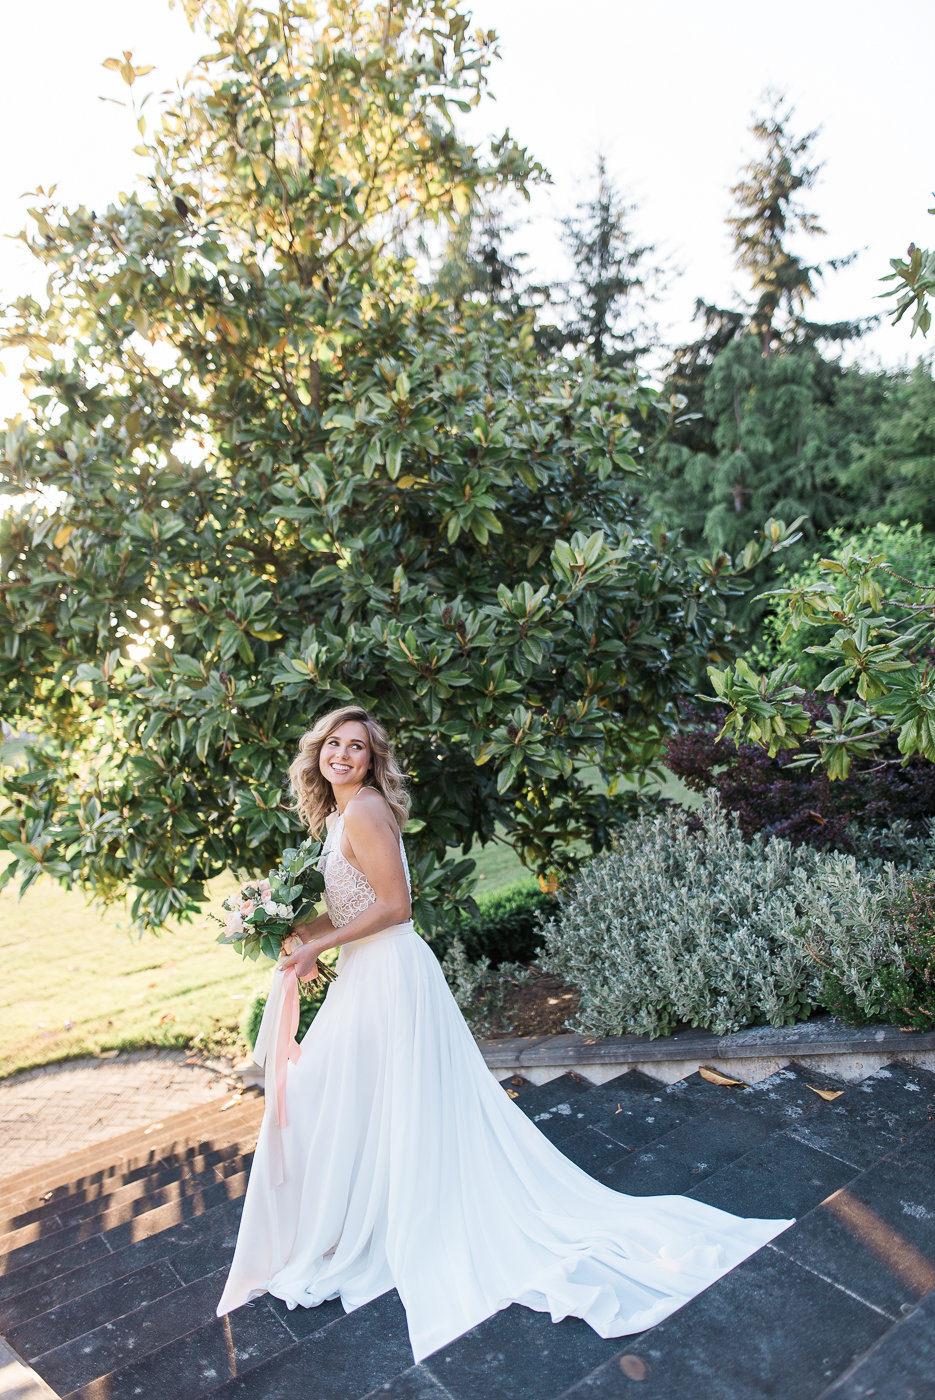 Watercolor & wallpaper wedding inspiration shoot